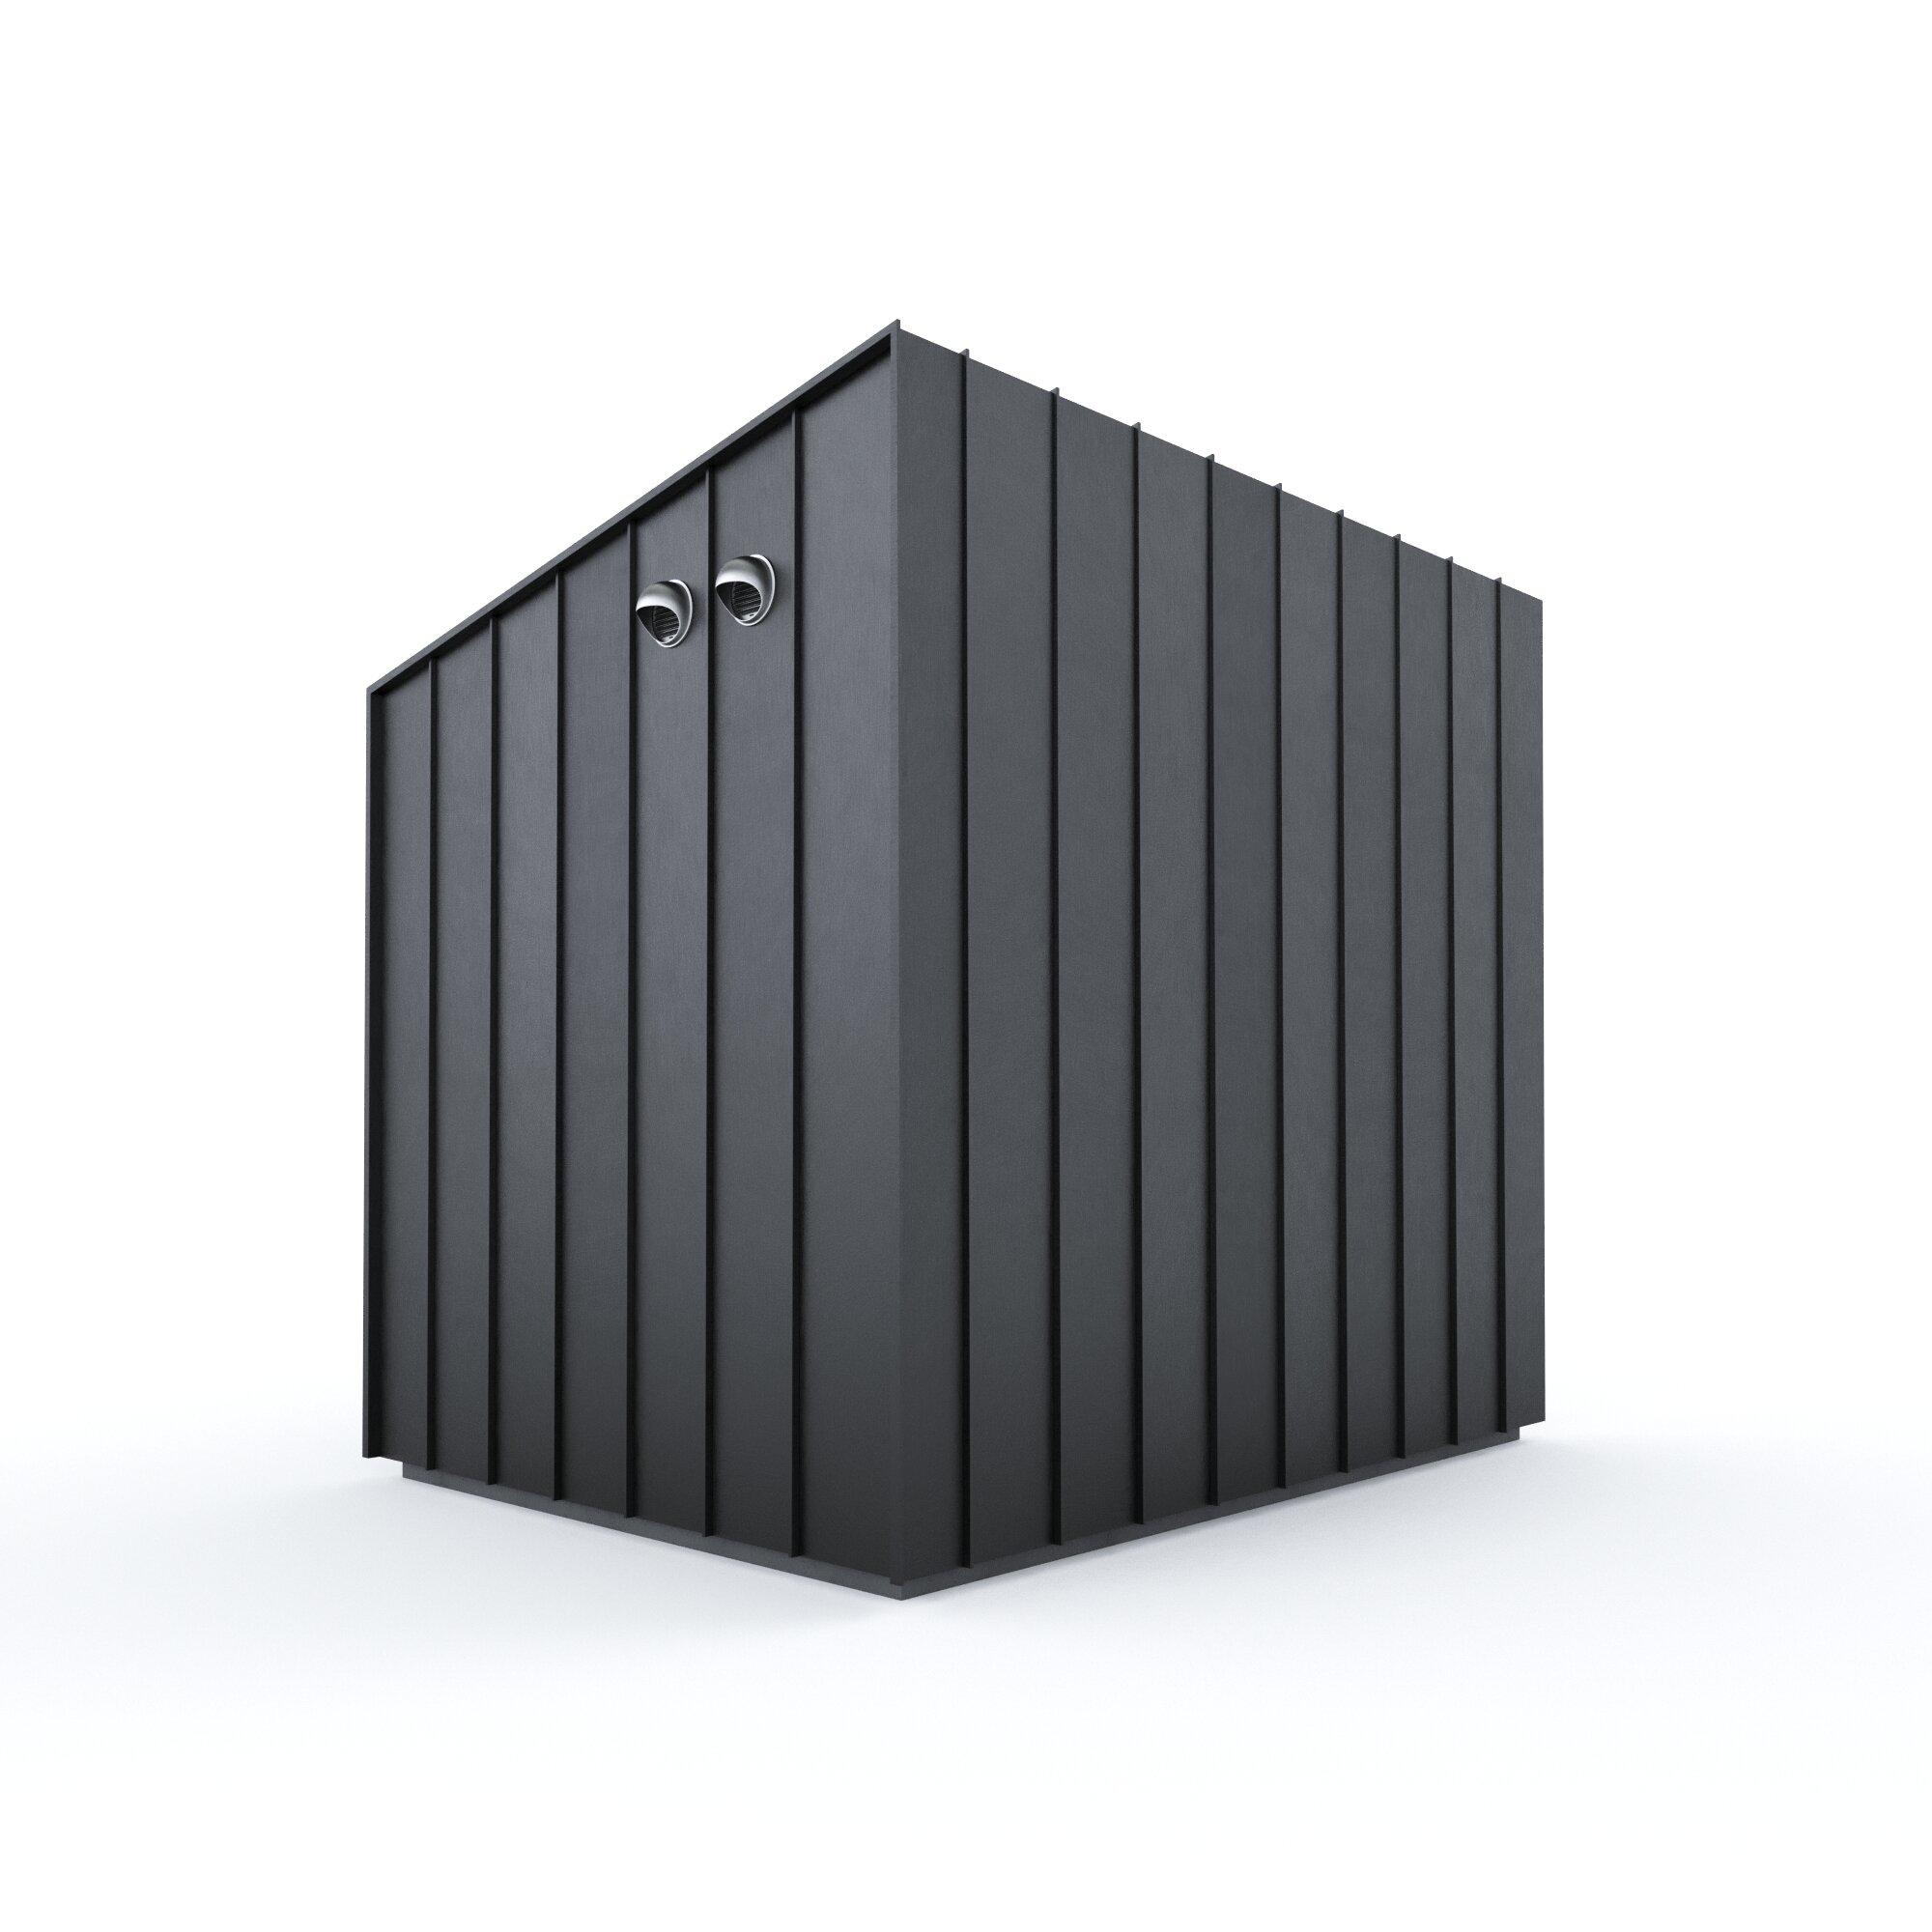 No optional windows - Base model